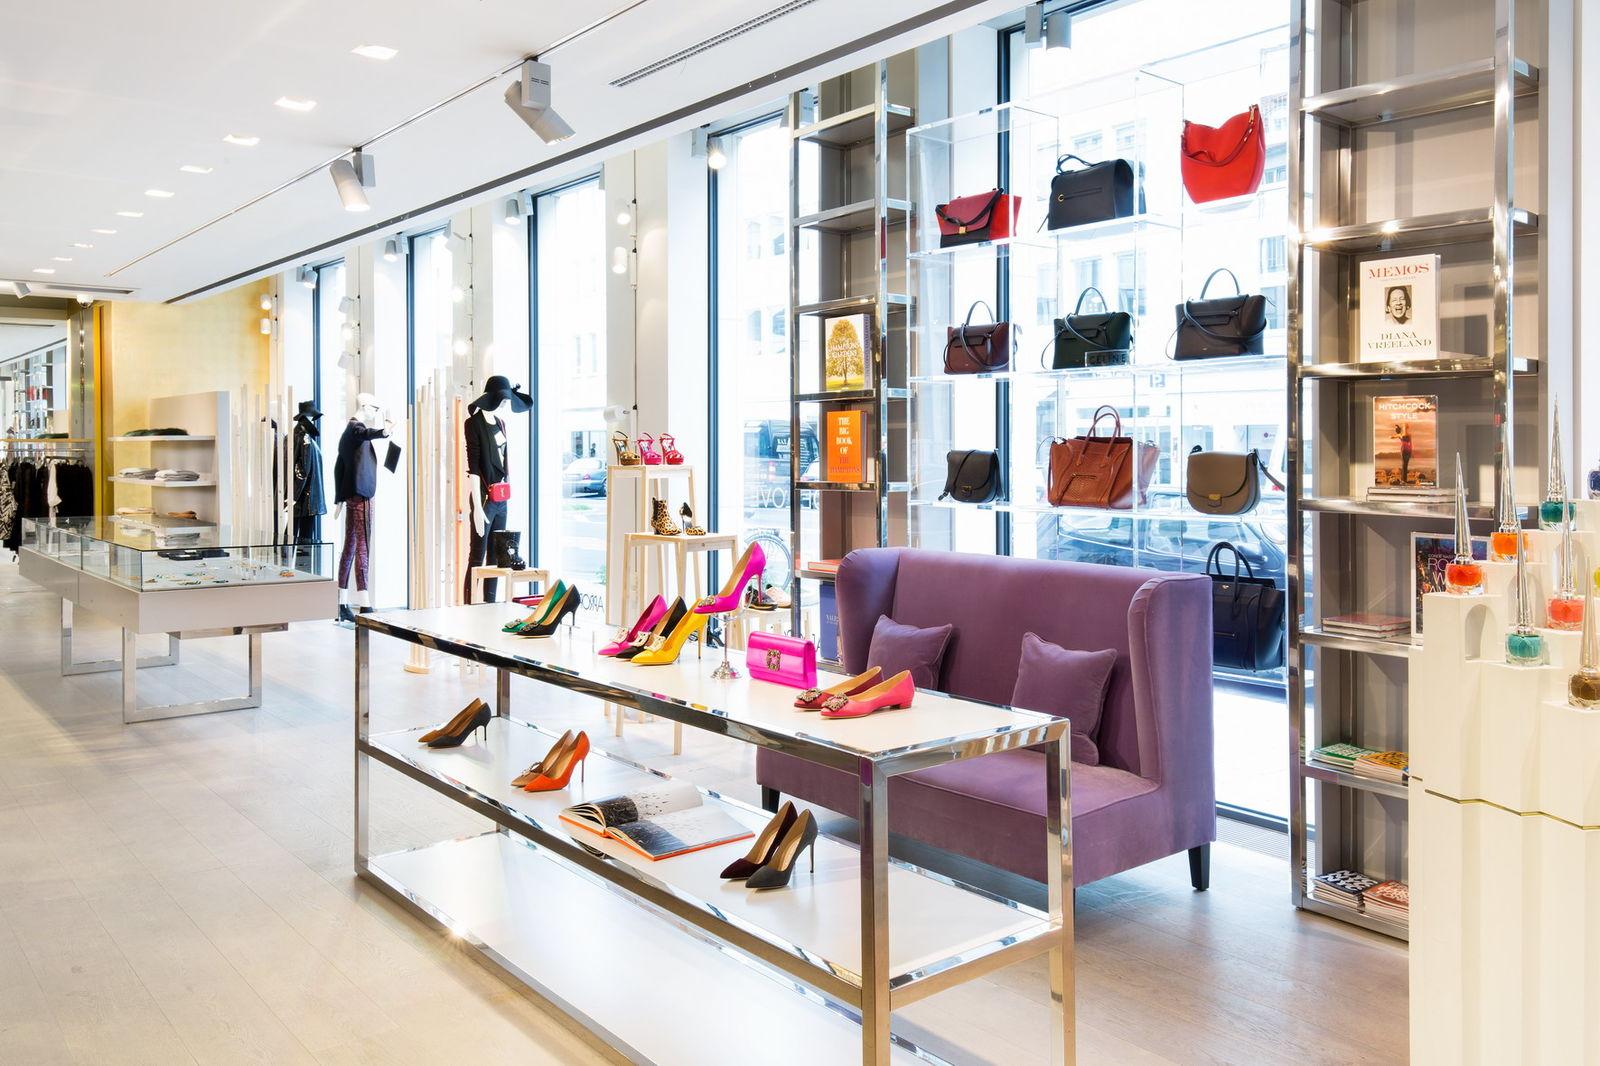 APROPOS The Concept Store in Düsseldorf (Bild 3)